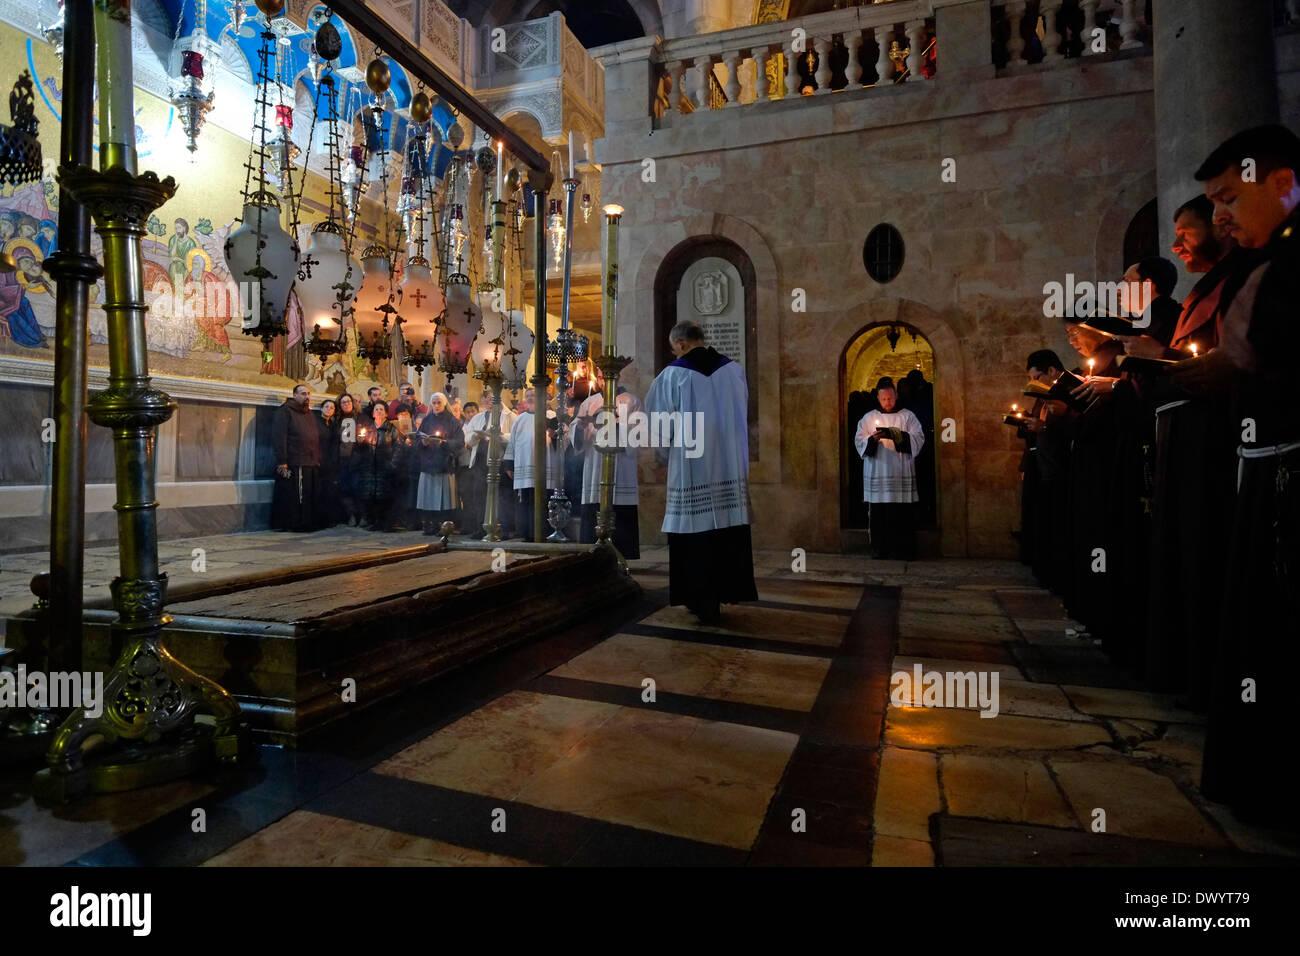 Christians Praying Stone Unction Church Stock Photos Amp Christians Praying Stone Unction Church